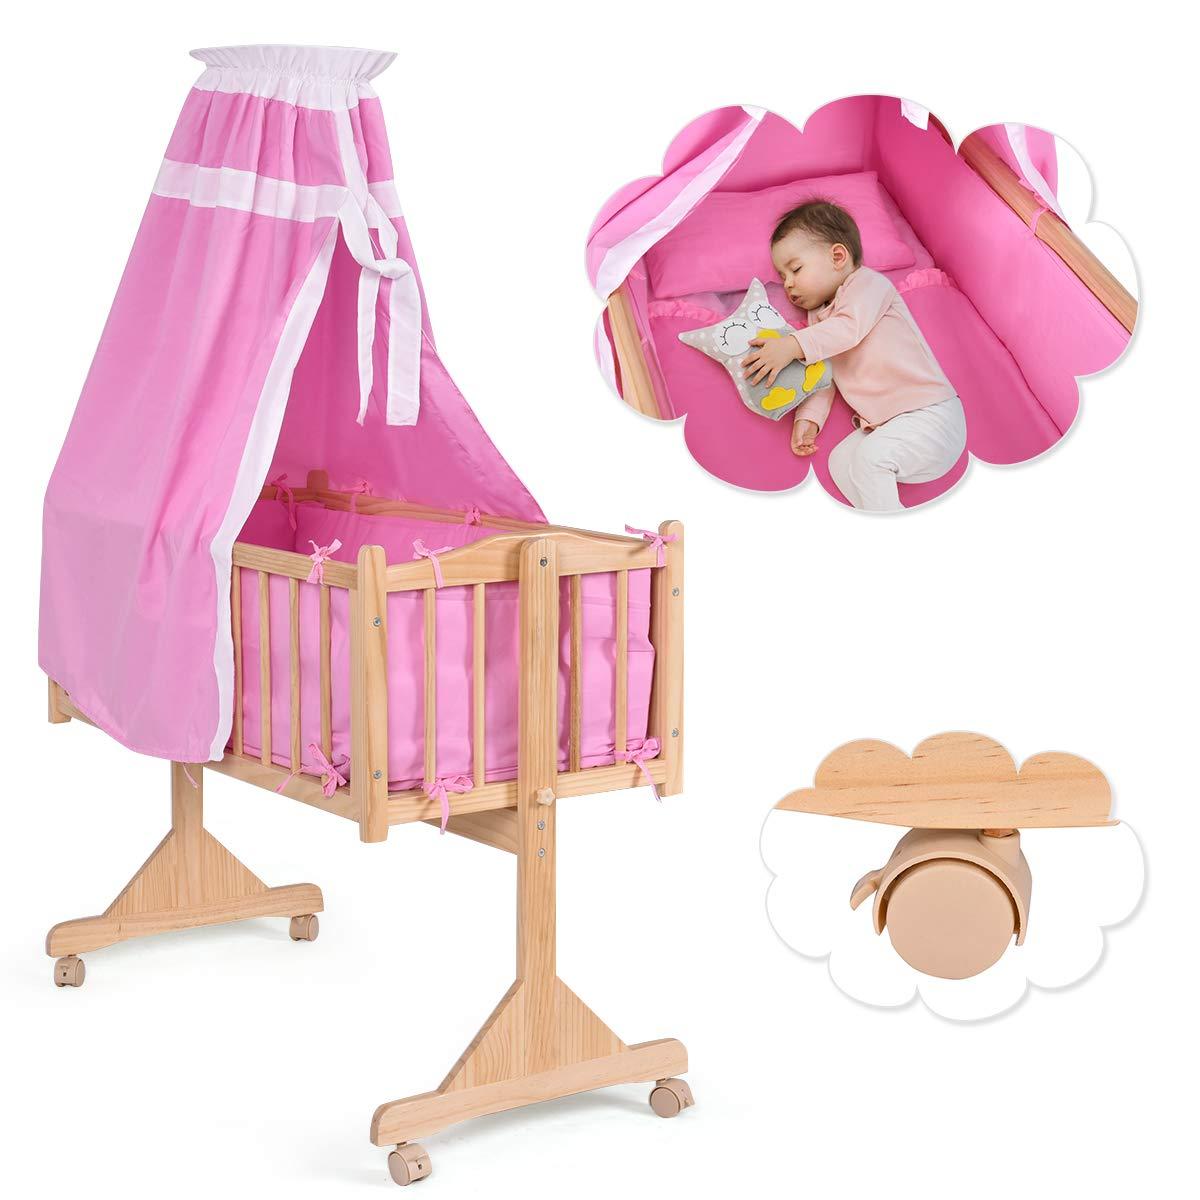 COSTWAY Stubenwagen Babywiege Schaukelwiege Babybett Holz Insekenschutz Matratze 3 Farben(Rosa) product image